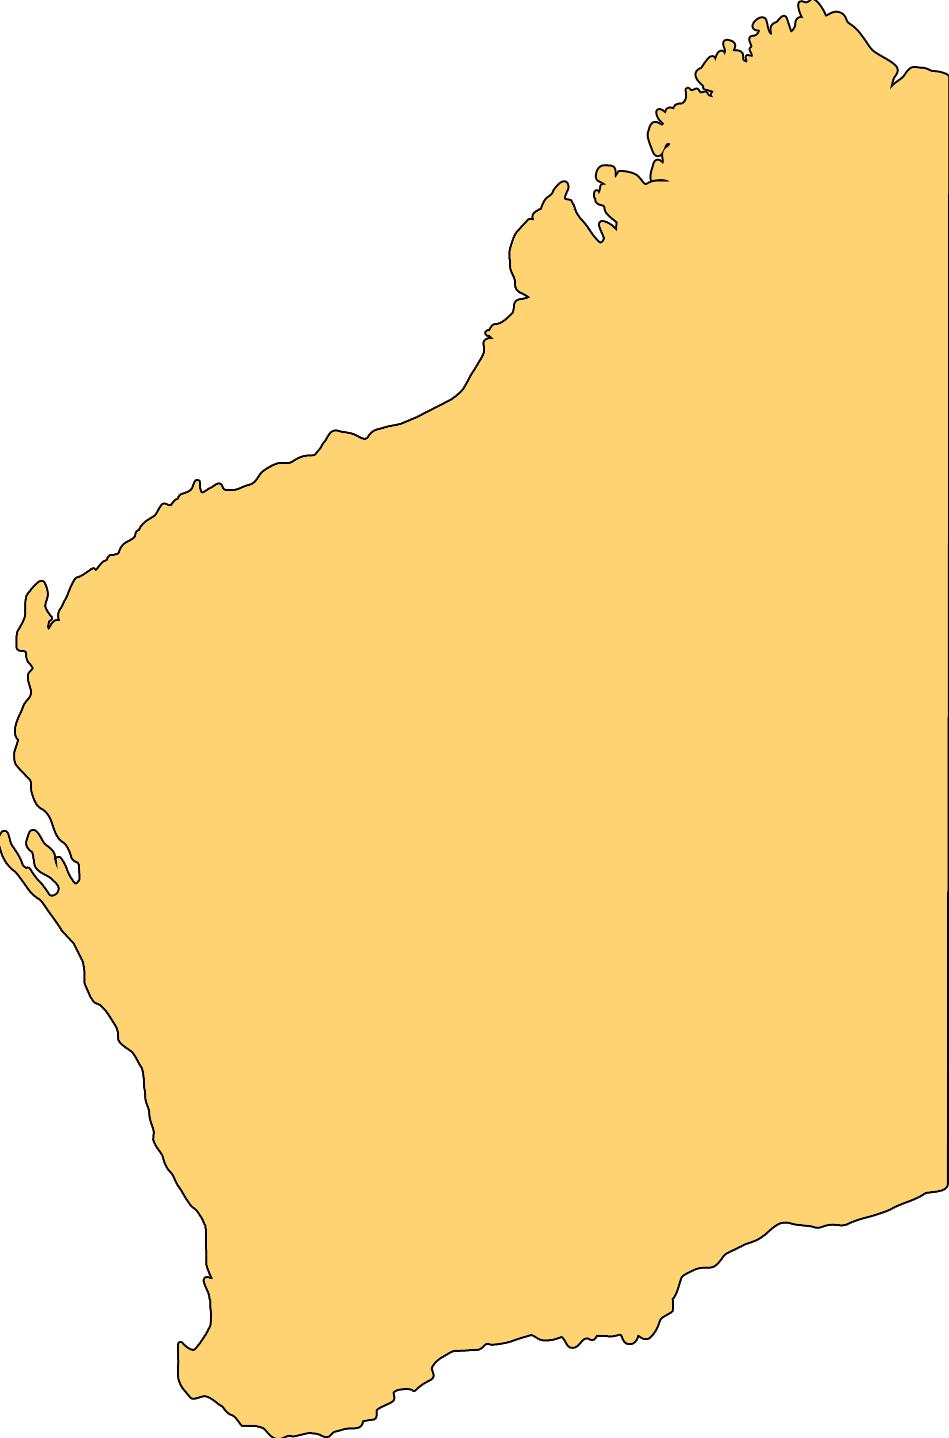 Blank Map of Western Australia.